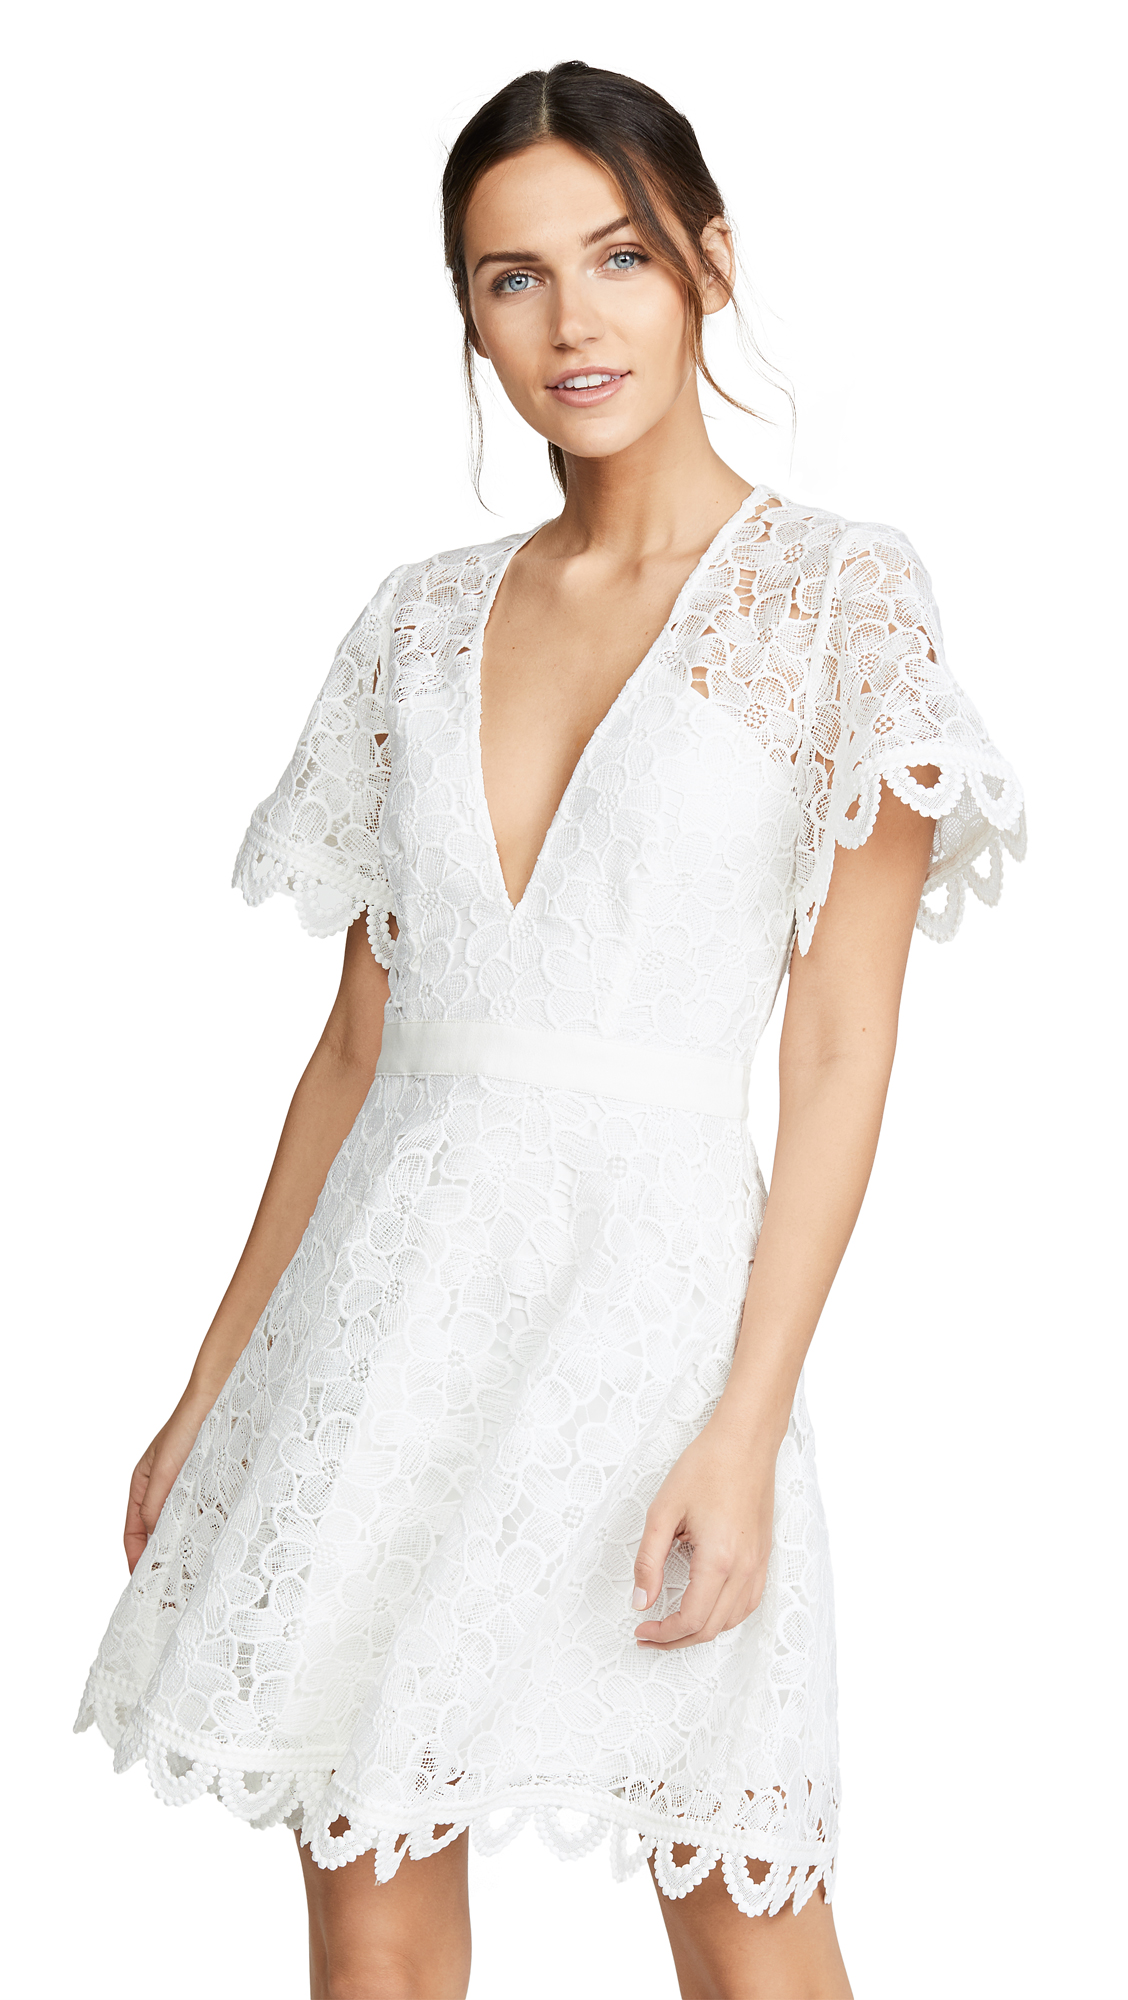 La Maison Talulah Infatuation Mini Dress - White Floral